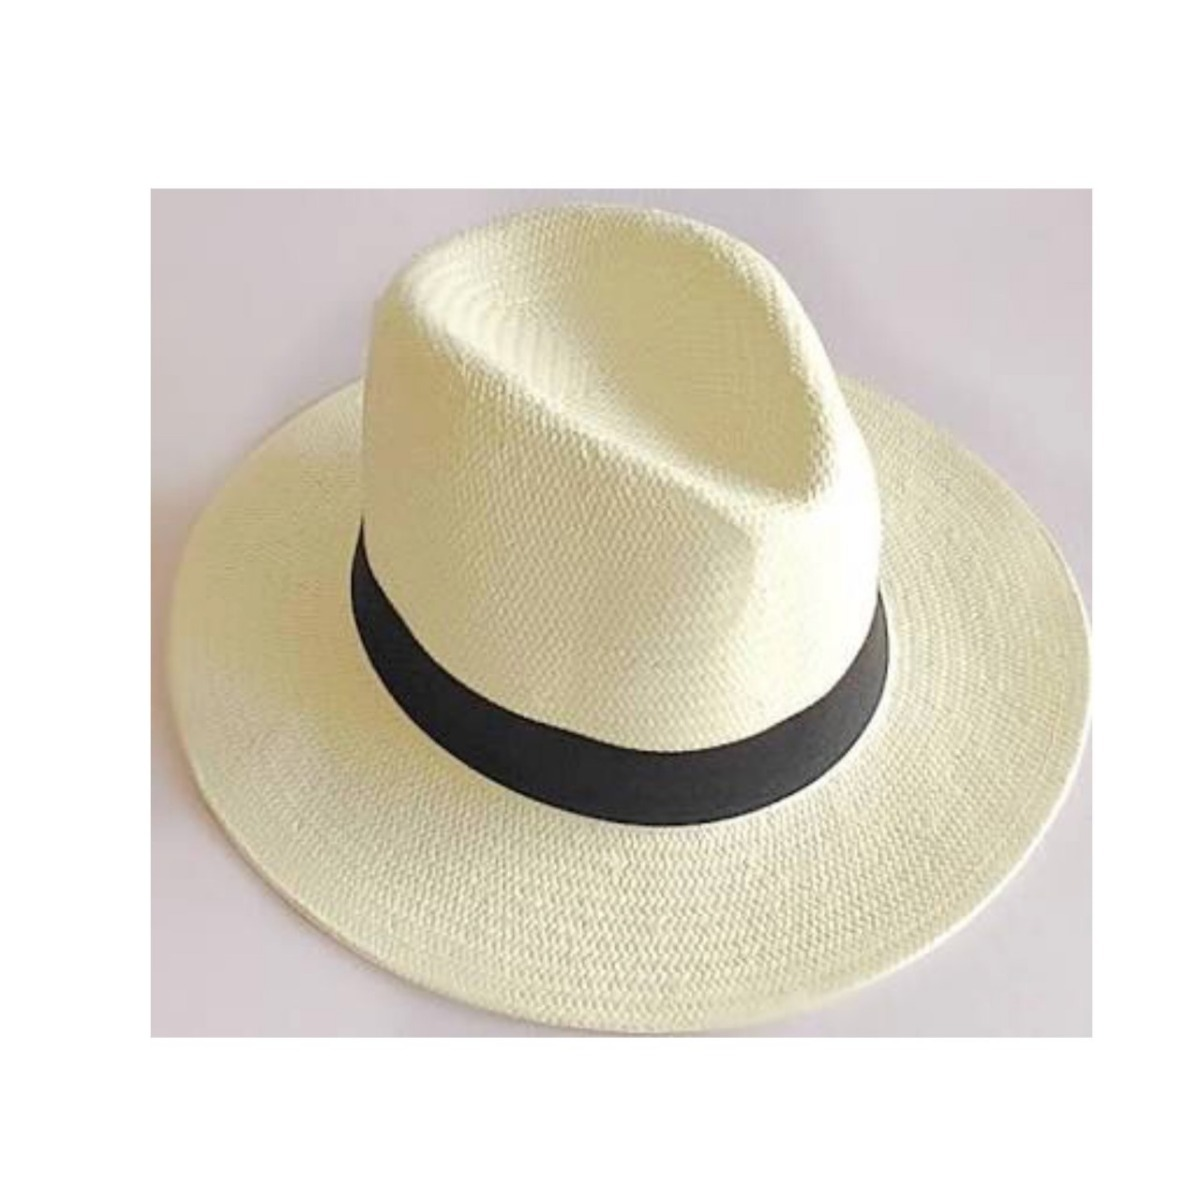 17935e3805f0b chapéu aba larga masculino feminino p praia dia dia férias. Carregando zoom.